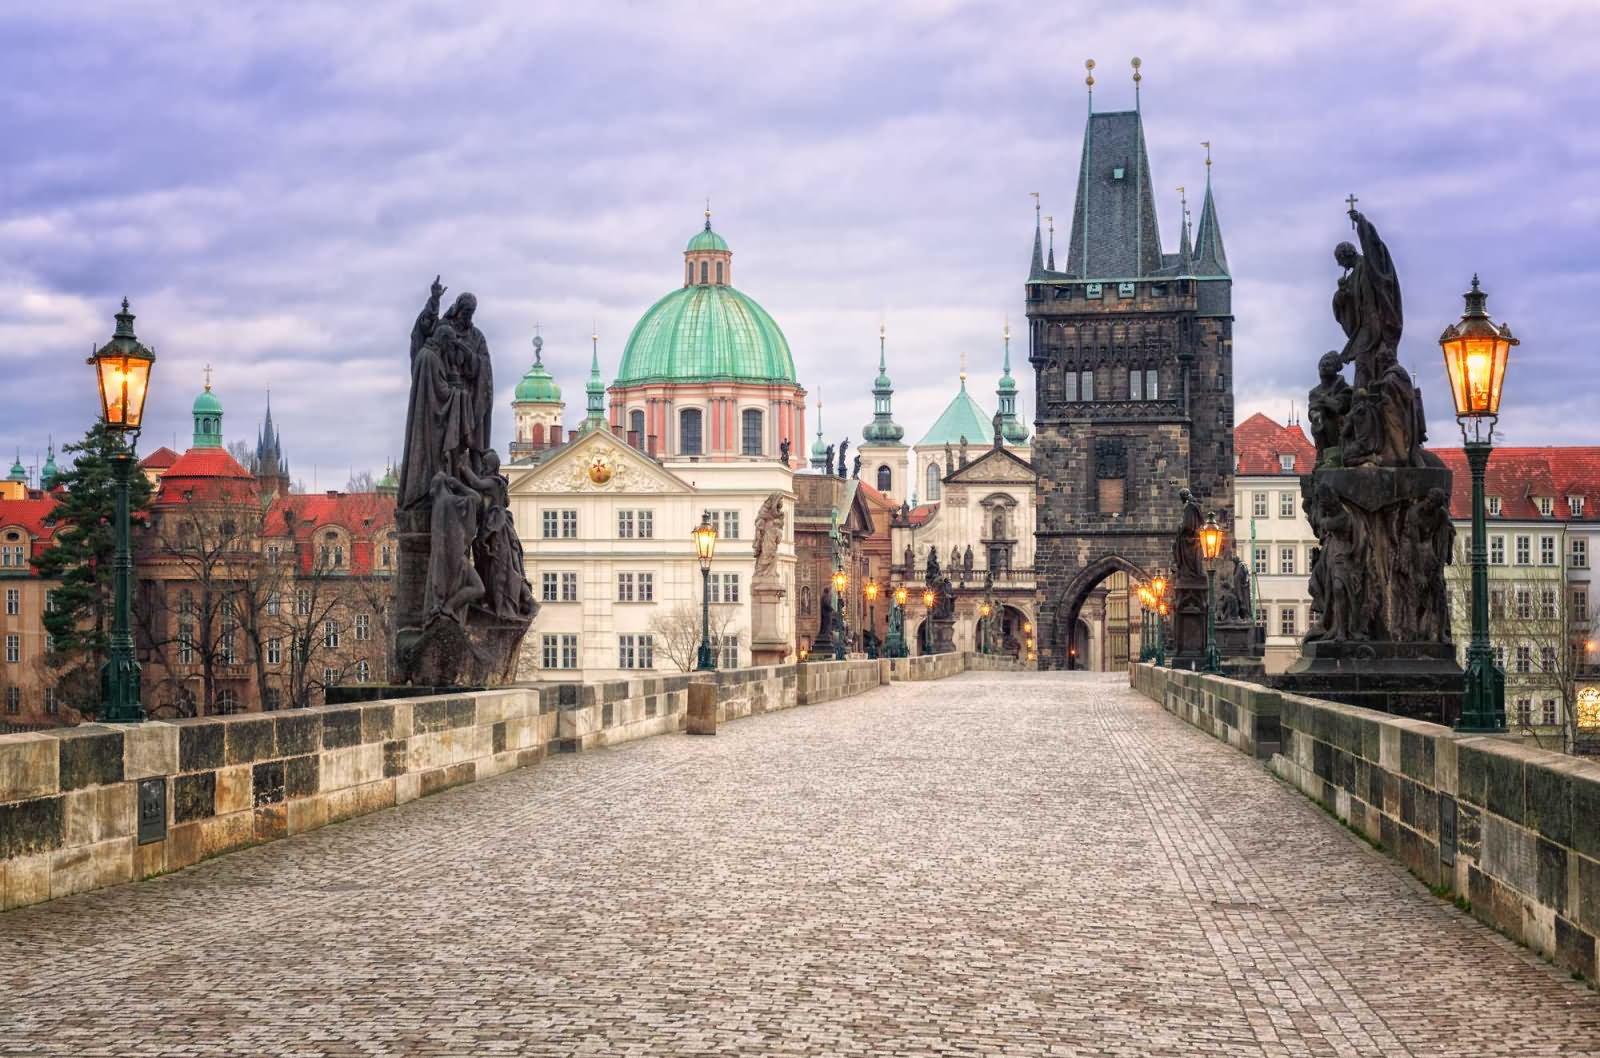 Charles Bridge,things to do in Prague